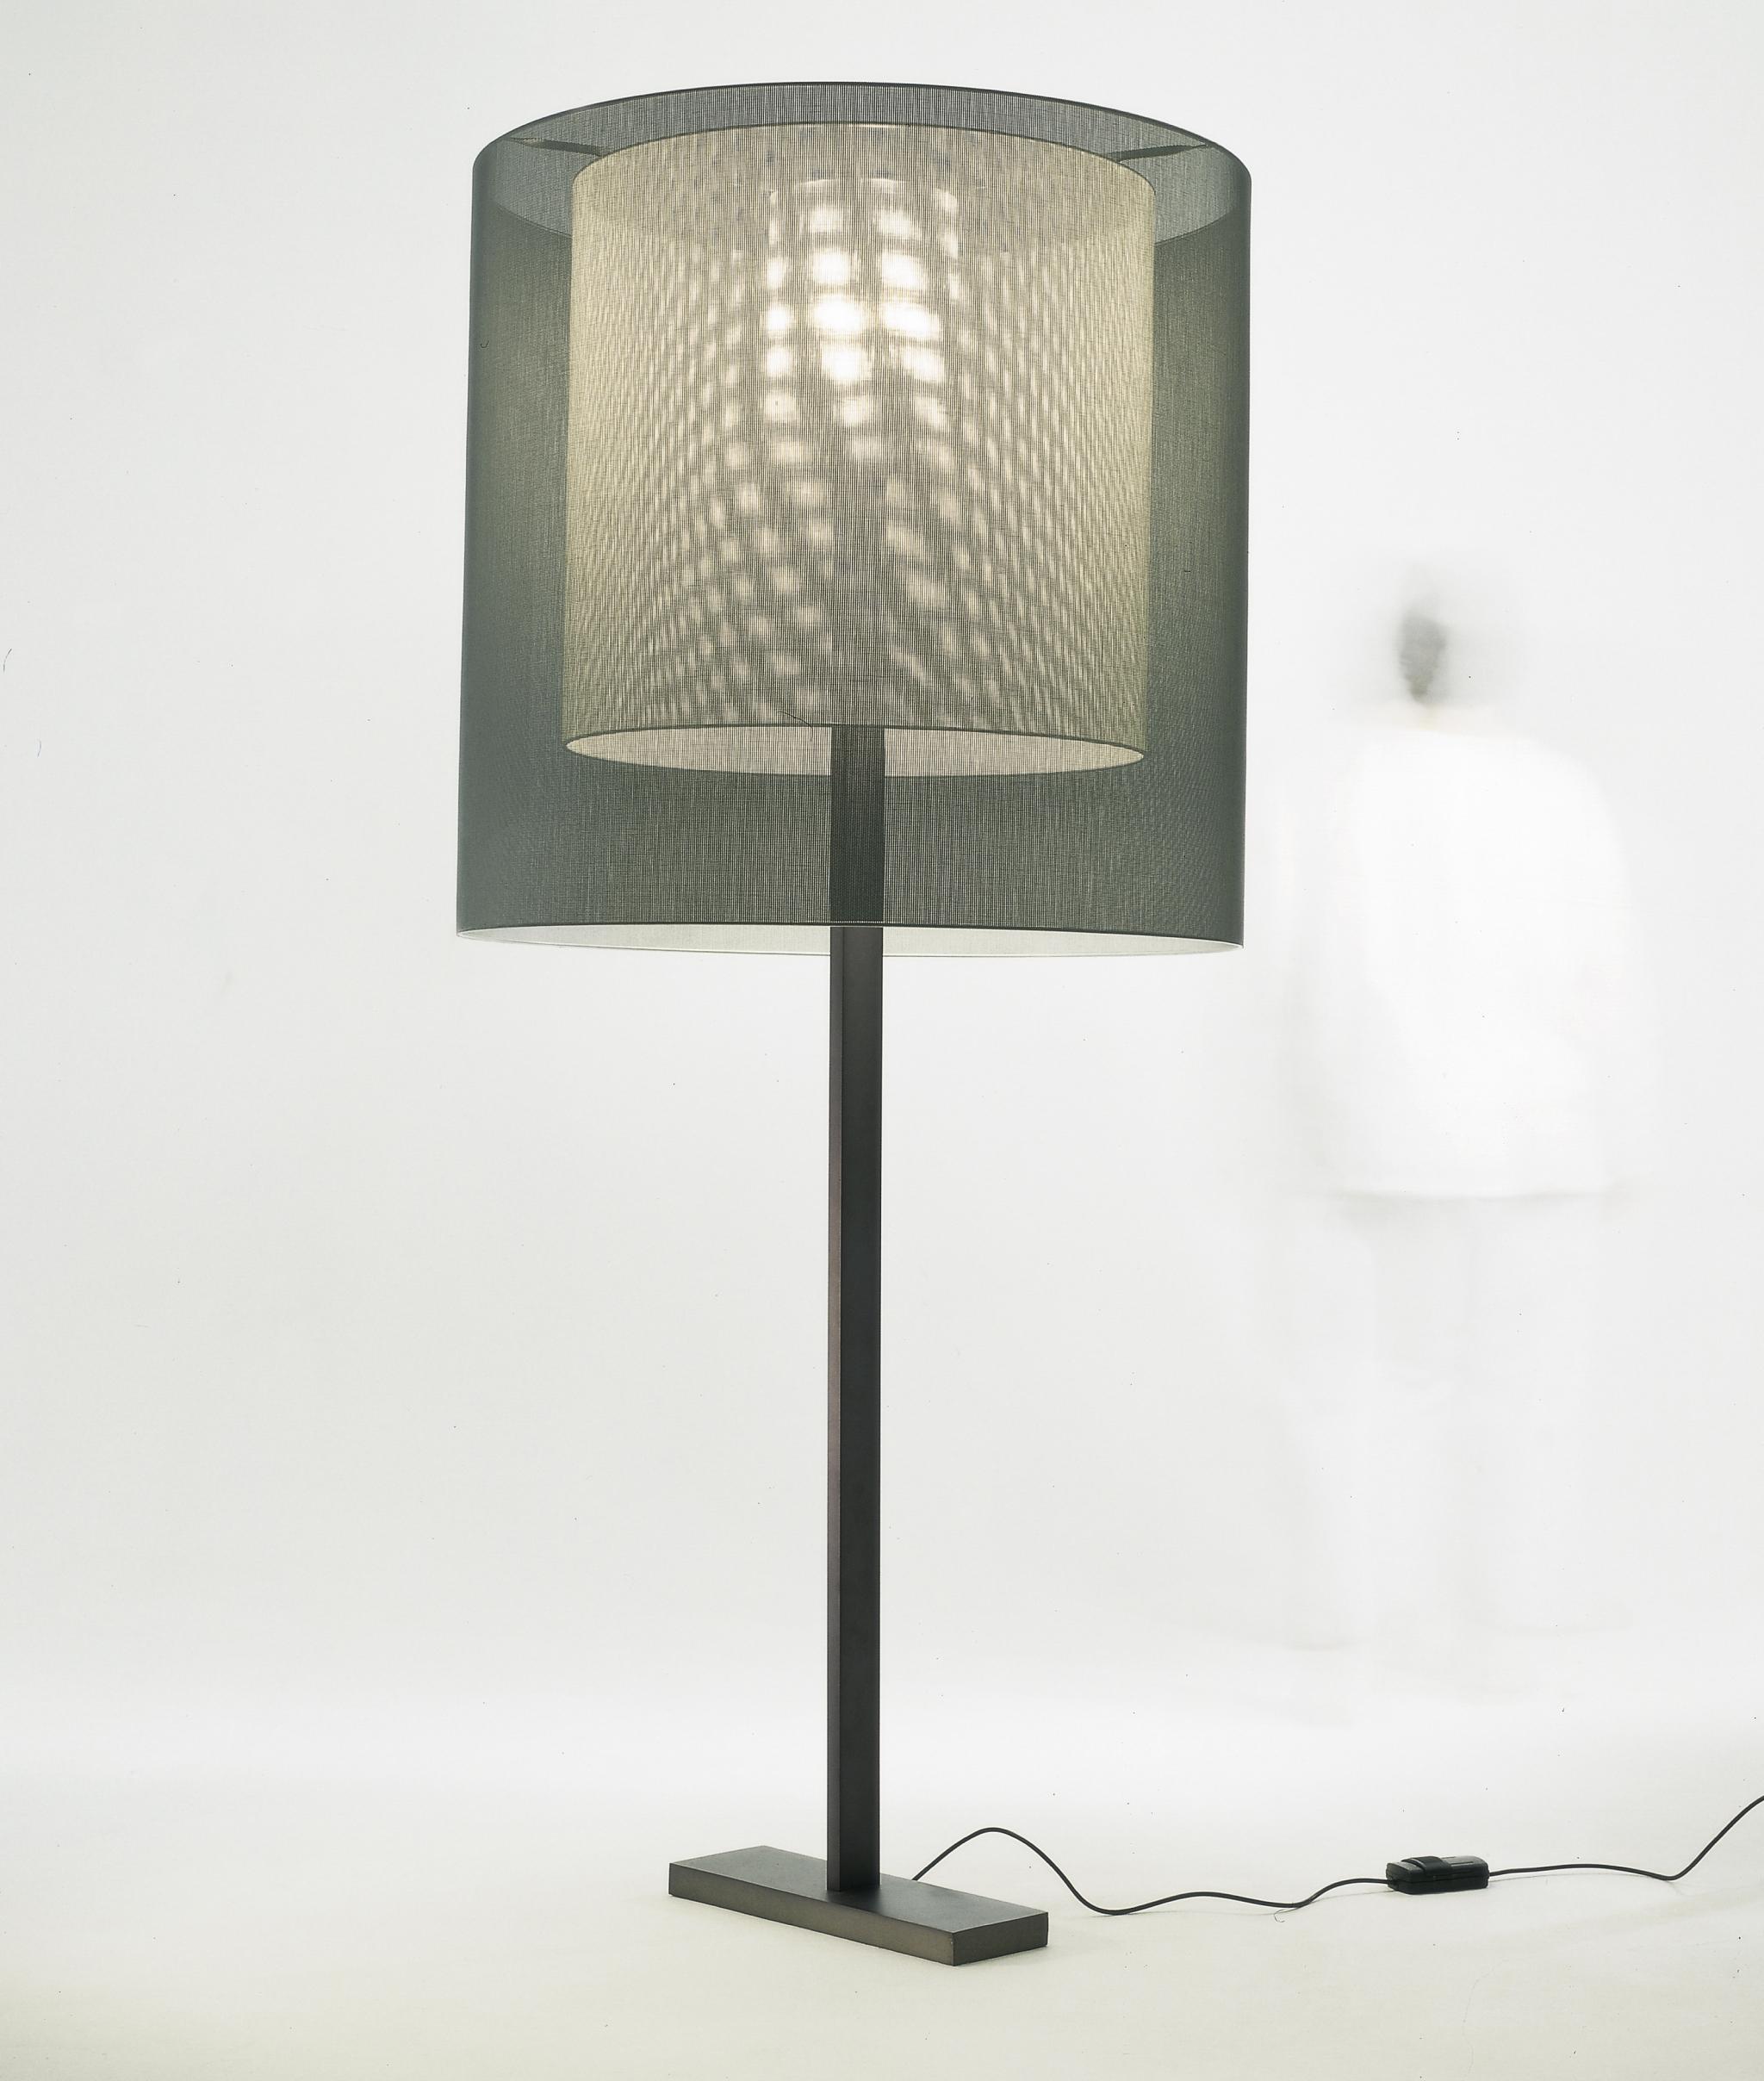 tripodes lamparas lamps catalogo cole lamp team carmenmasia santa suspension raw en pendant de distributor